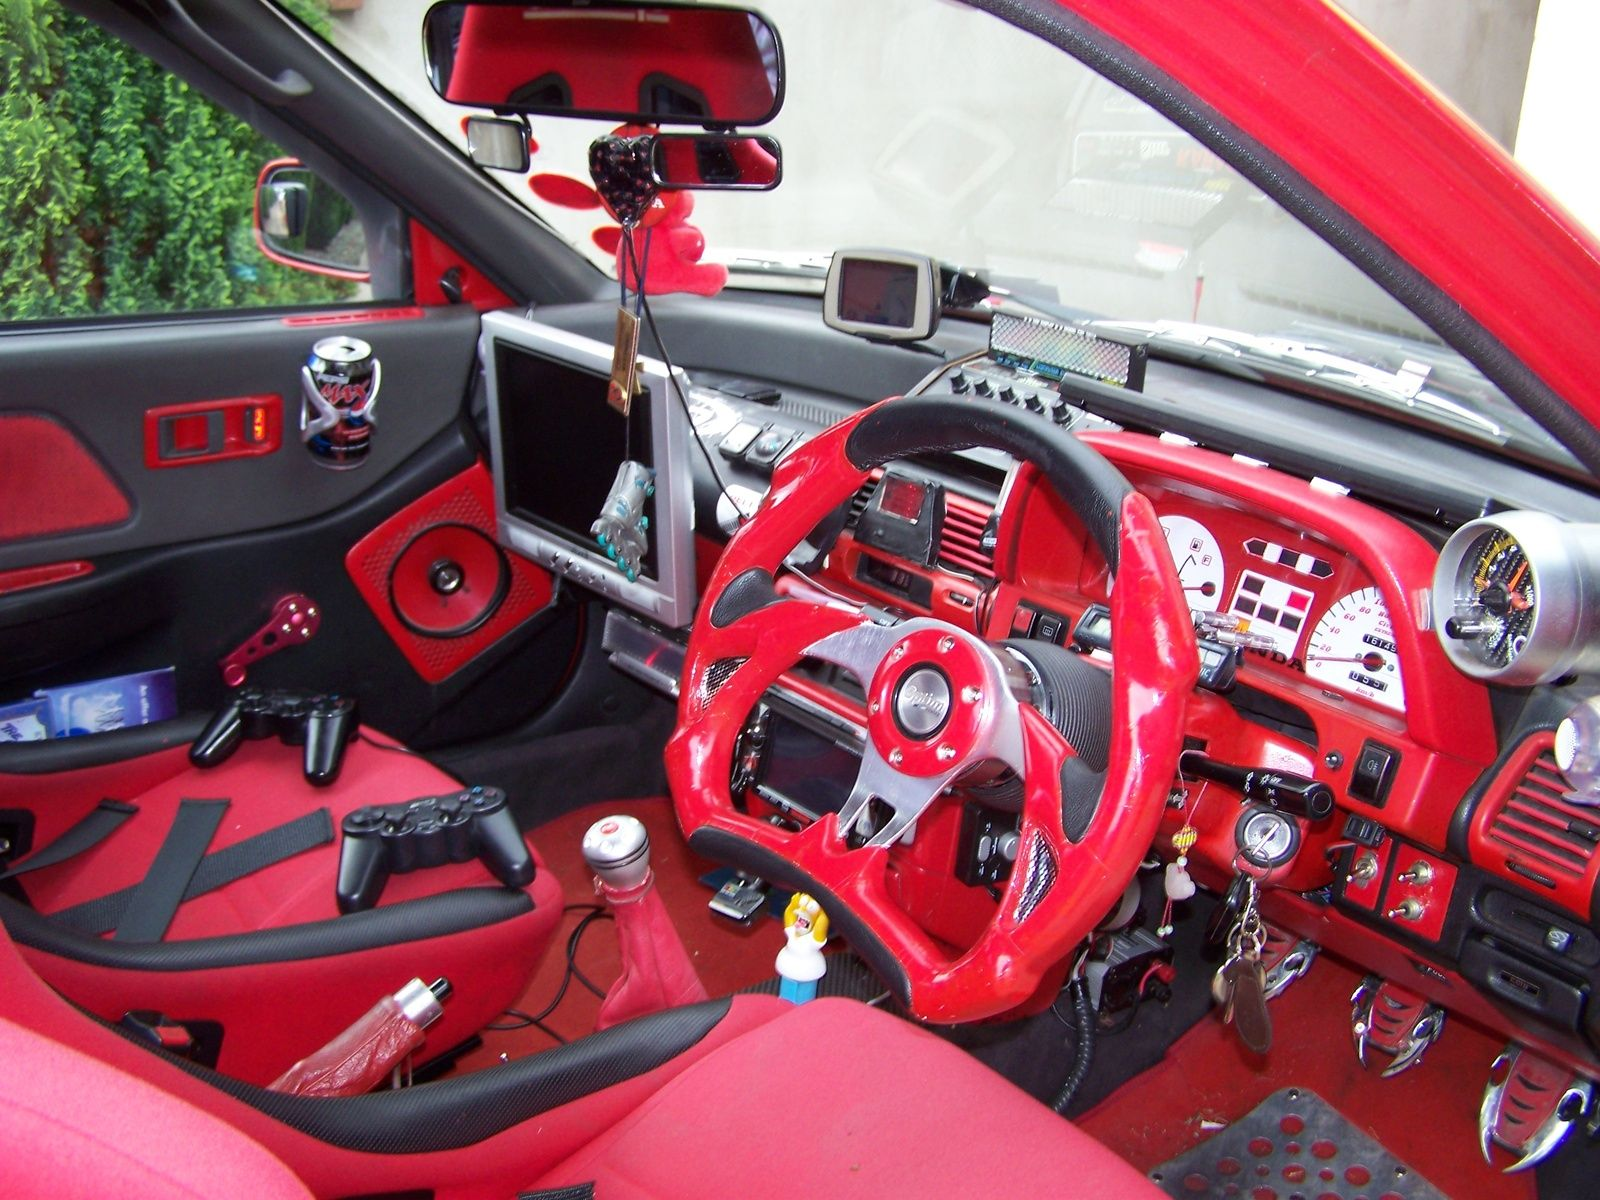 1991 Honda Civic Hatchback Wiring Diagram Vw Polo 2002 Dx Bad Ass Hatchbacks